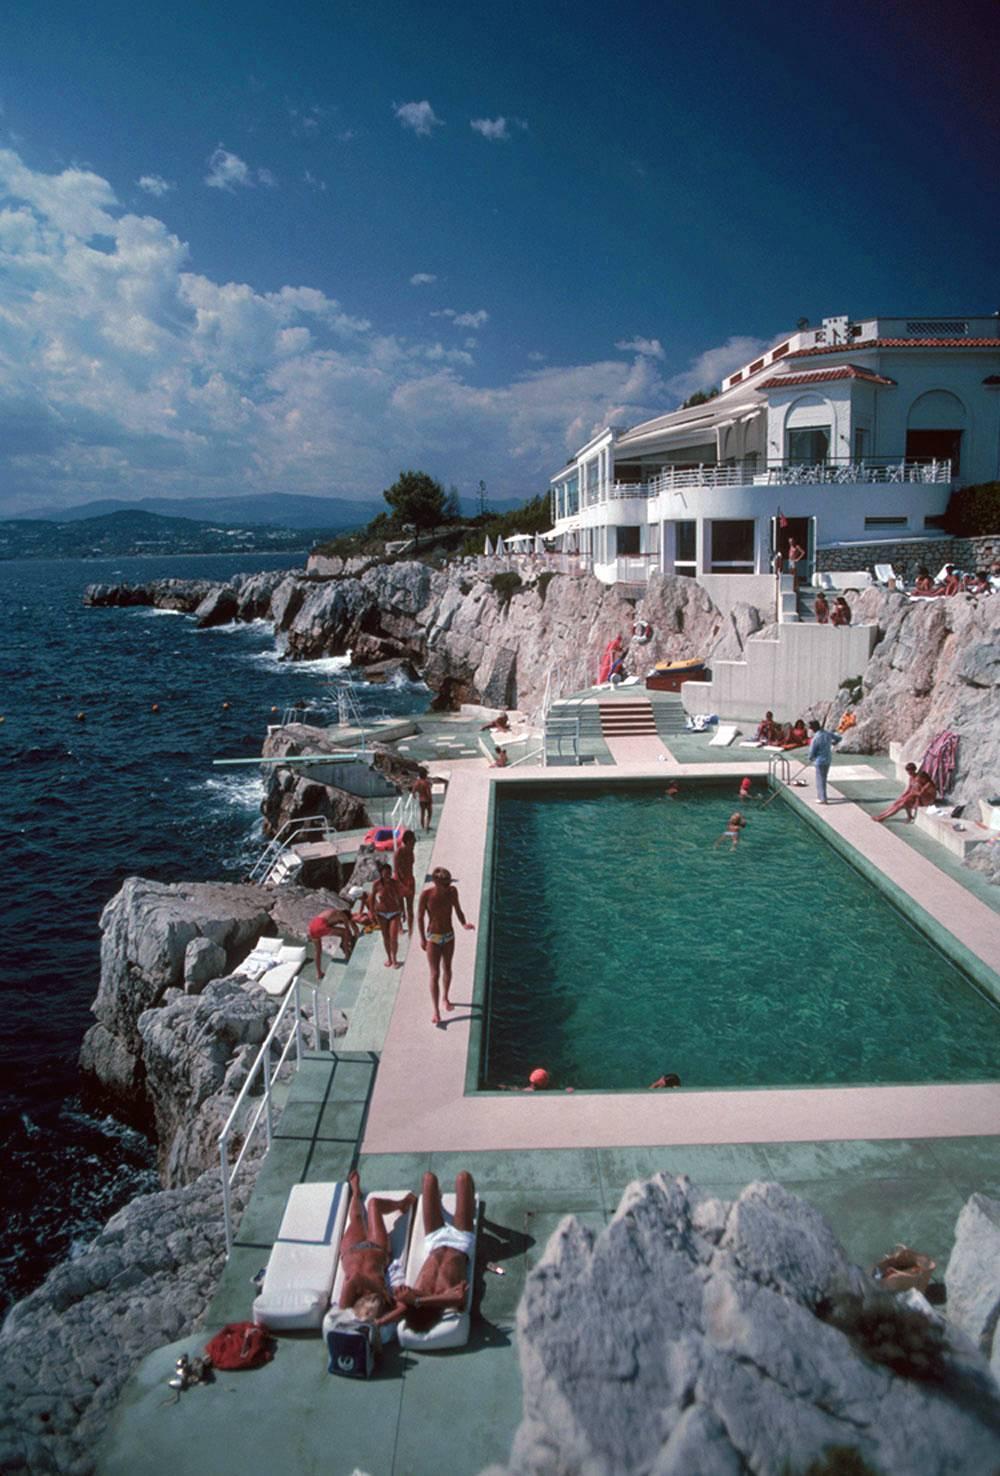 Hôtel du Cap Eden-Roc Estate Edition Photograph: Poolside in Antibes